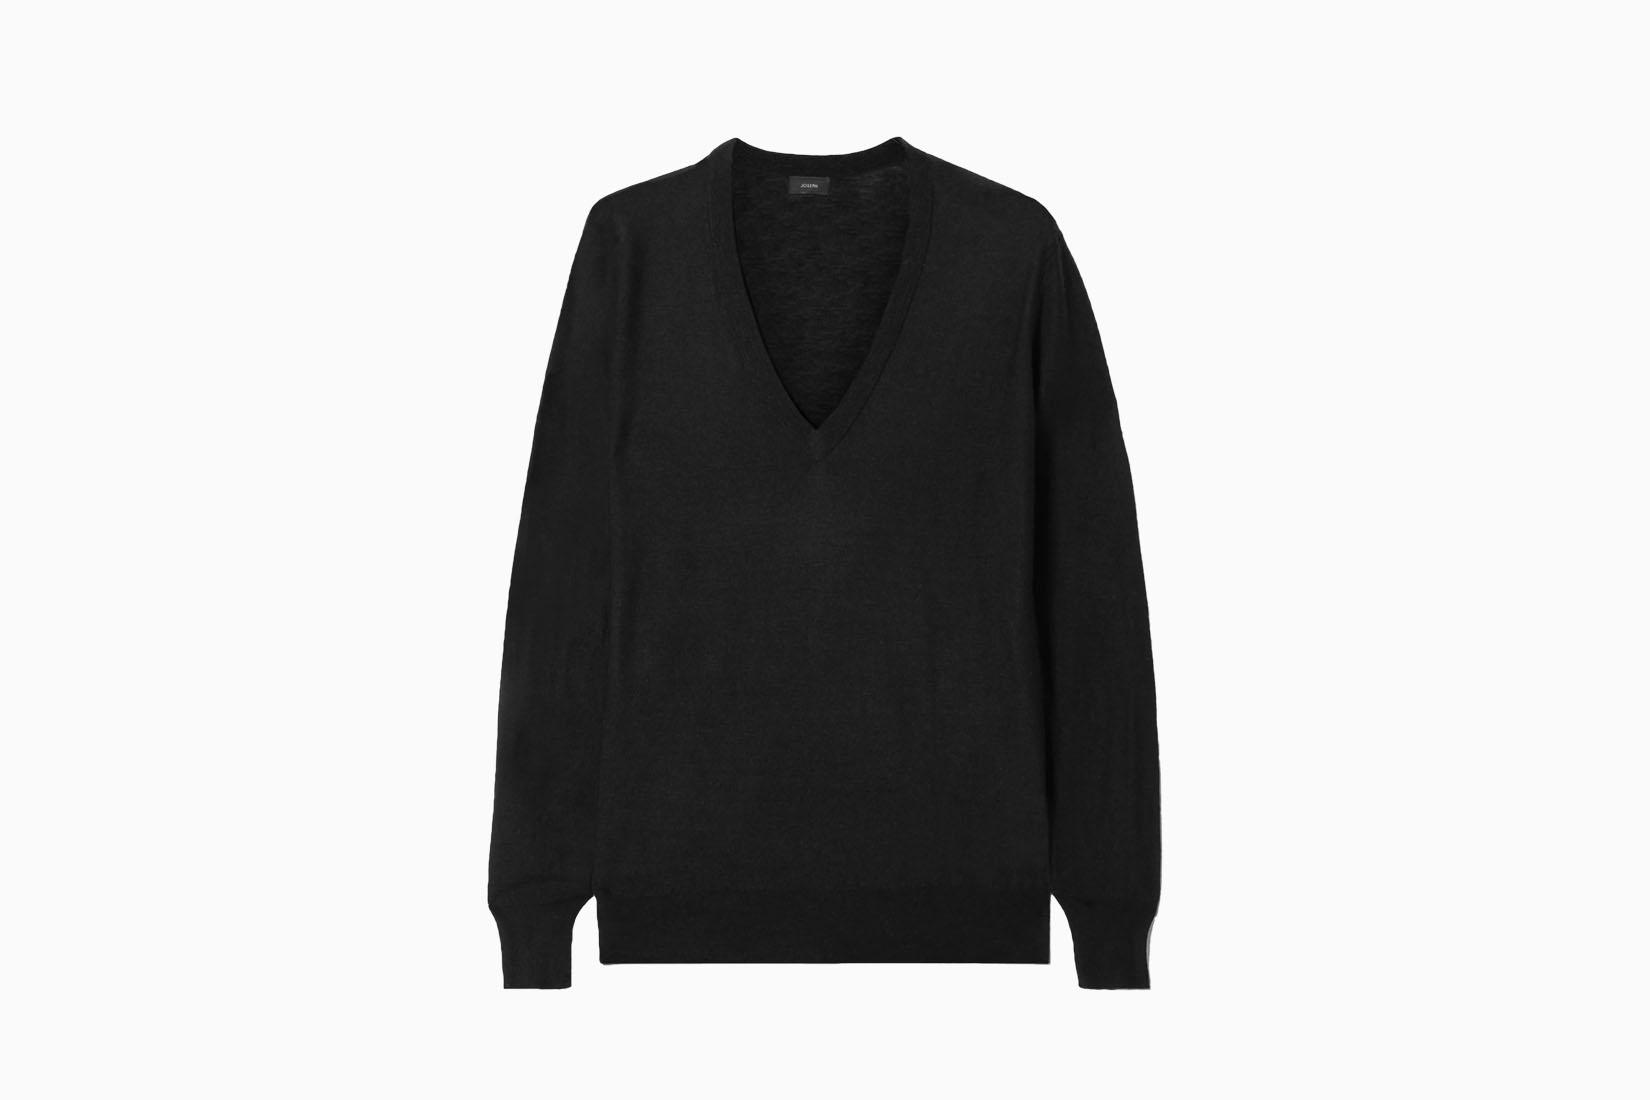 best cashmere sweaters women joseph review Luxe Digital